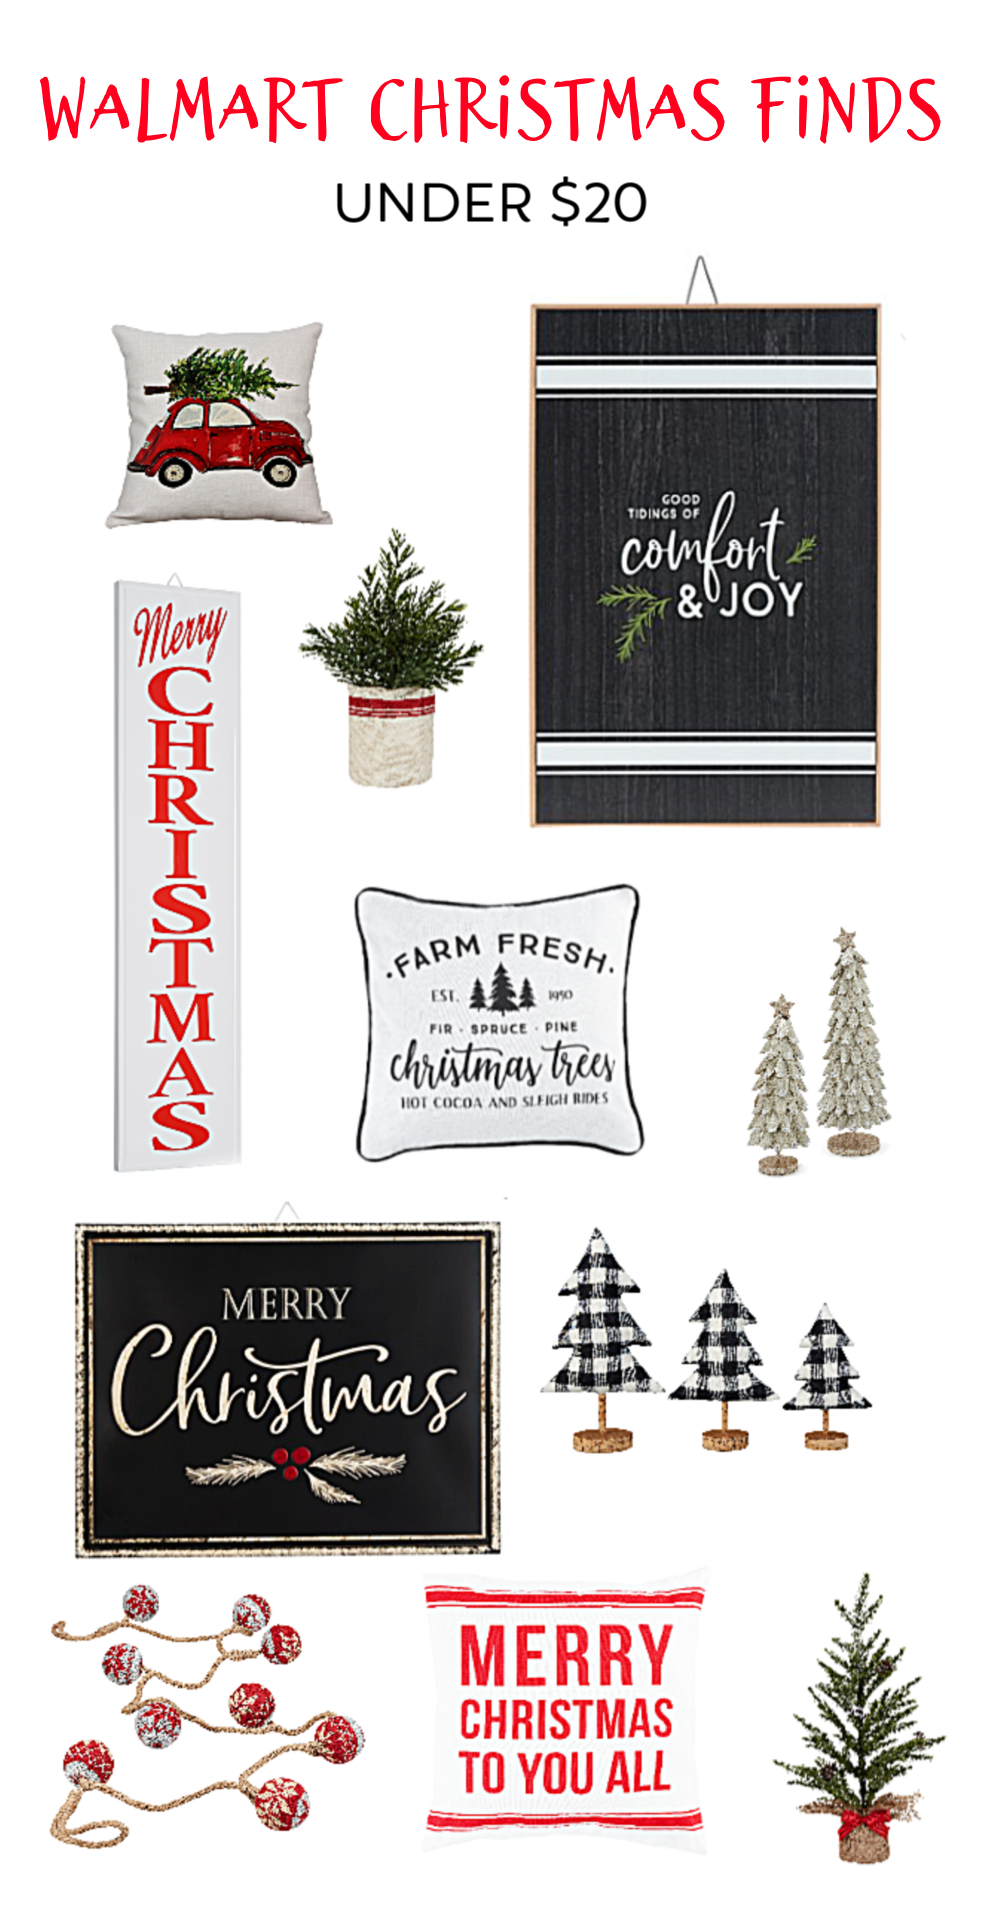 Walmart Christmas Finds Under 20 Merry Christmas To You Merry Christmas Sign Christmas Signs